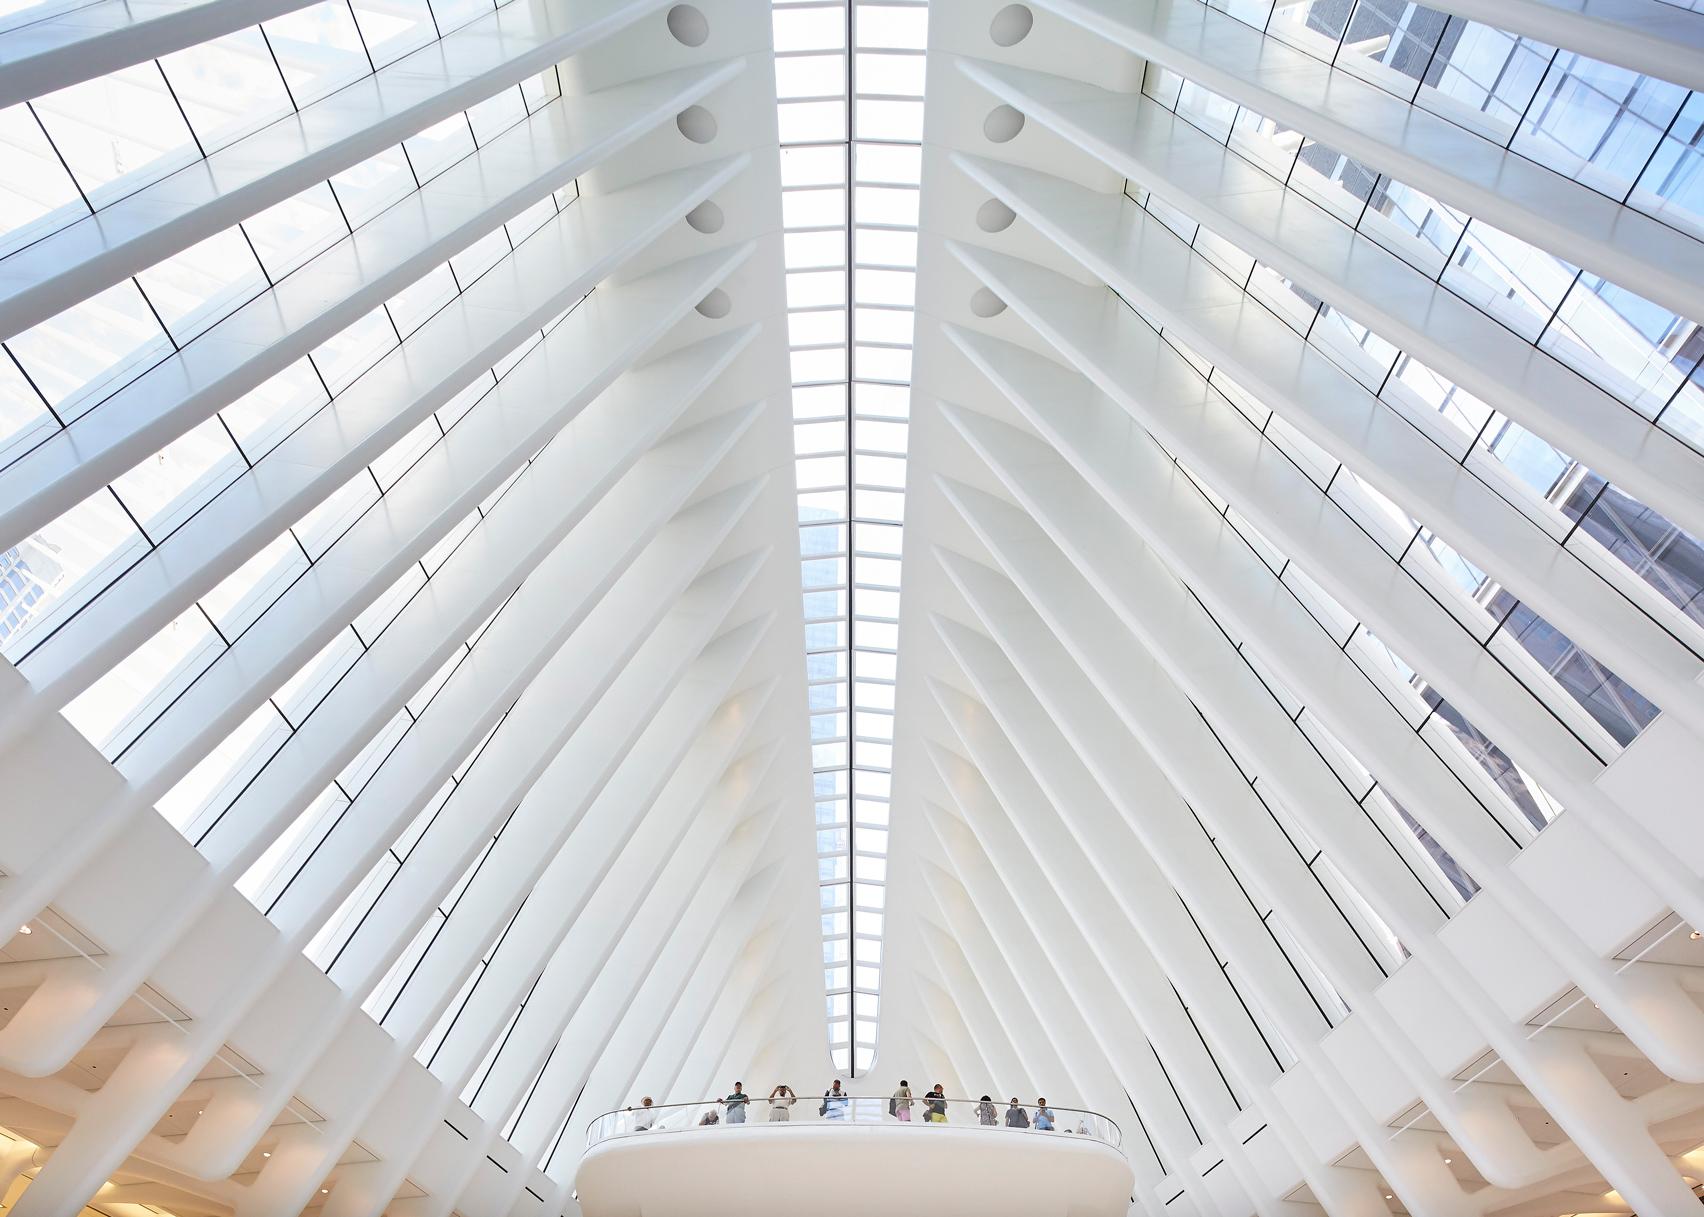 World Trade Center Transportation Hub Oculus by Santiago Calatrava